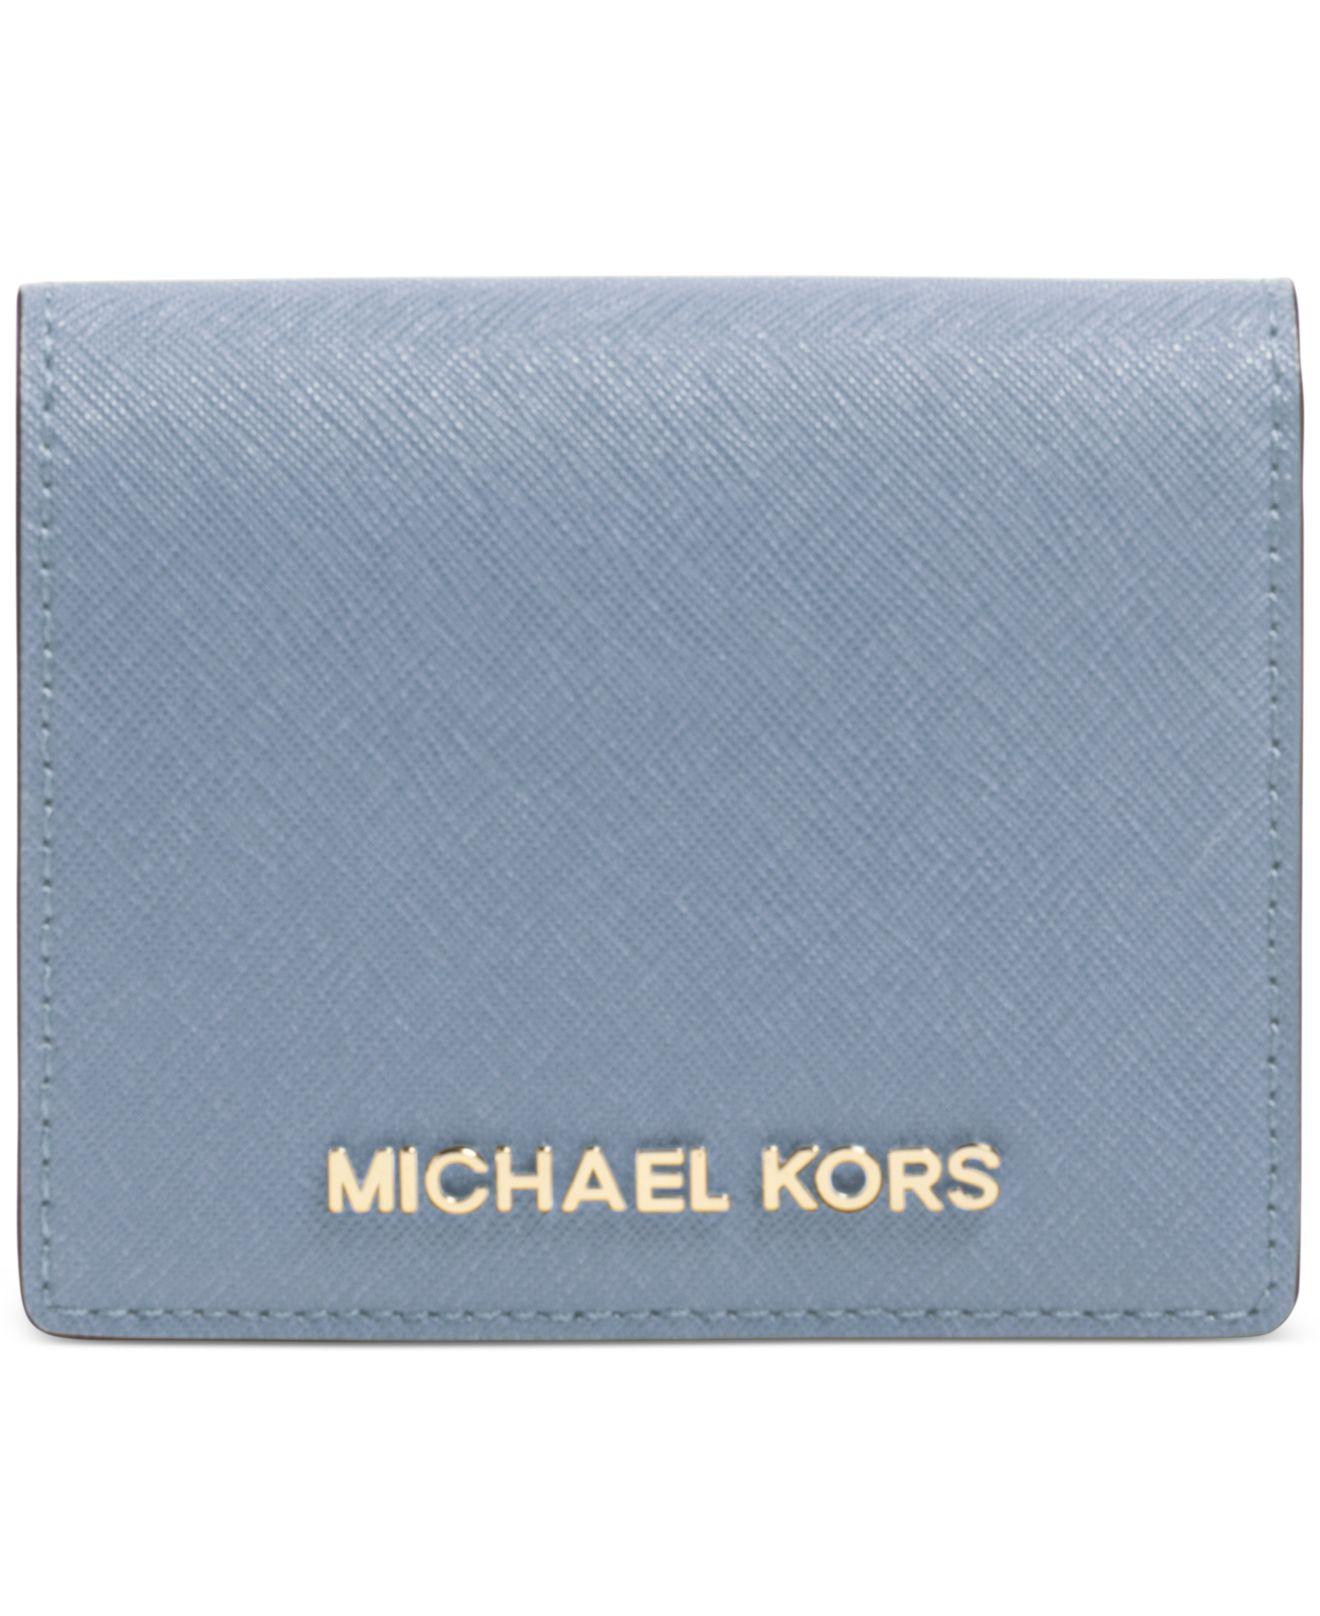 6c0fe12fd345 Lyst - Michael Kors Michael Jet Set Travel Flap Card Holder in Blue